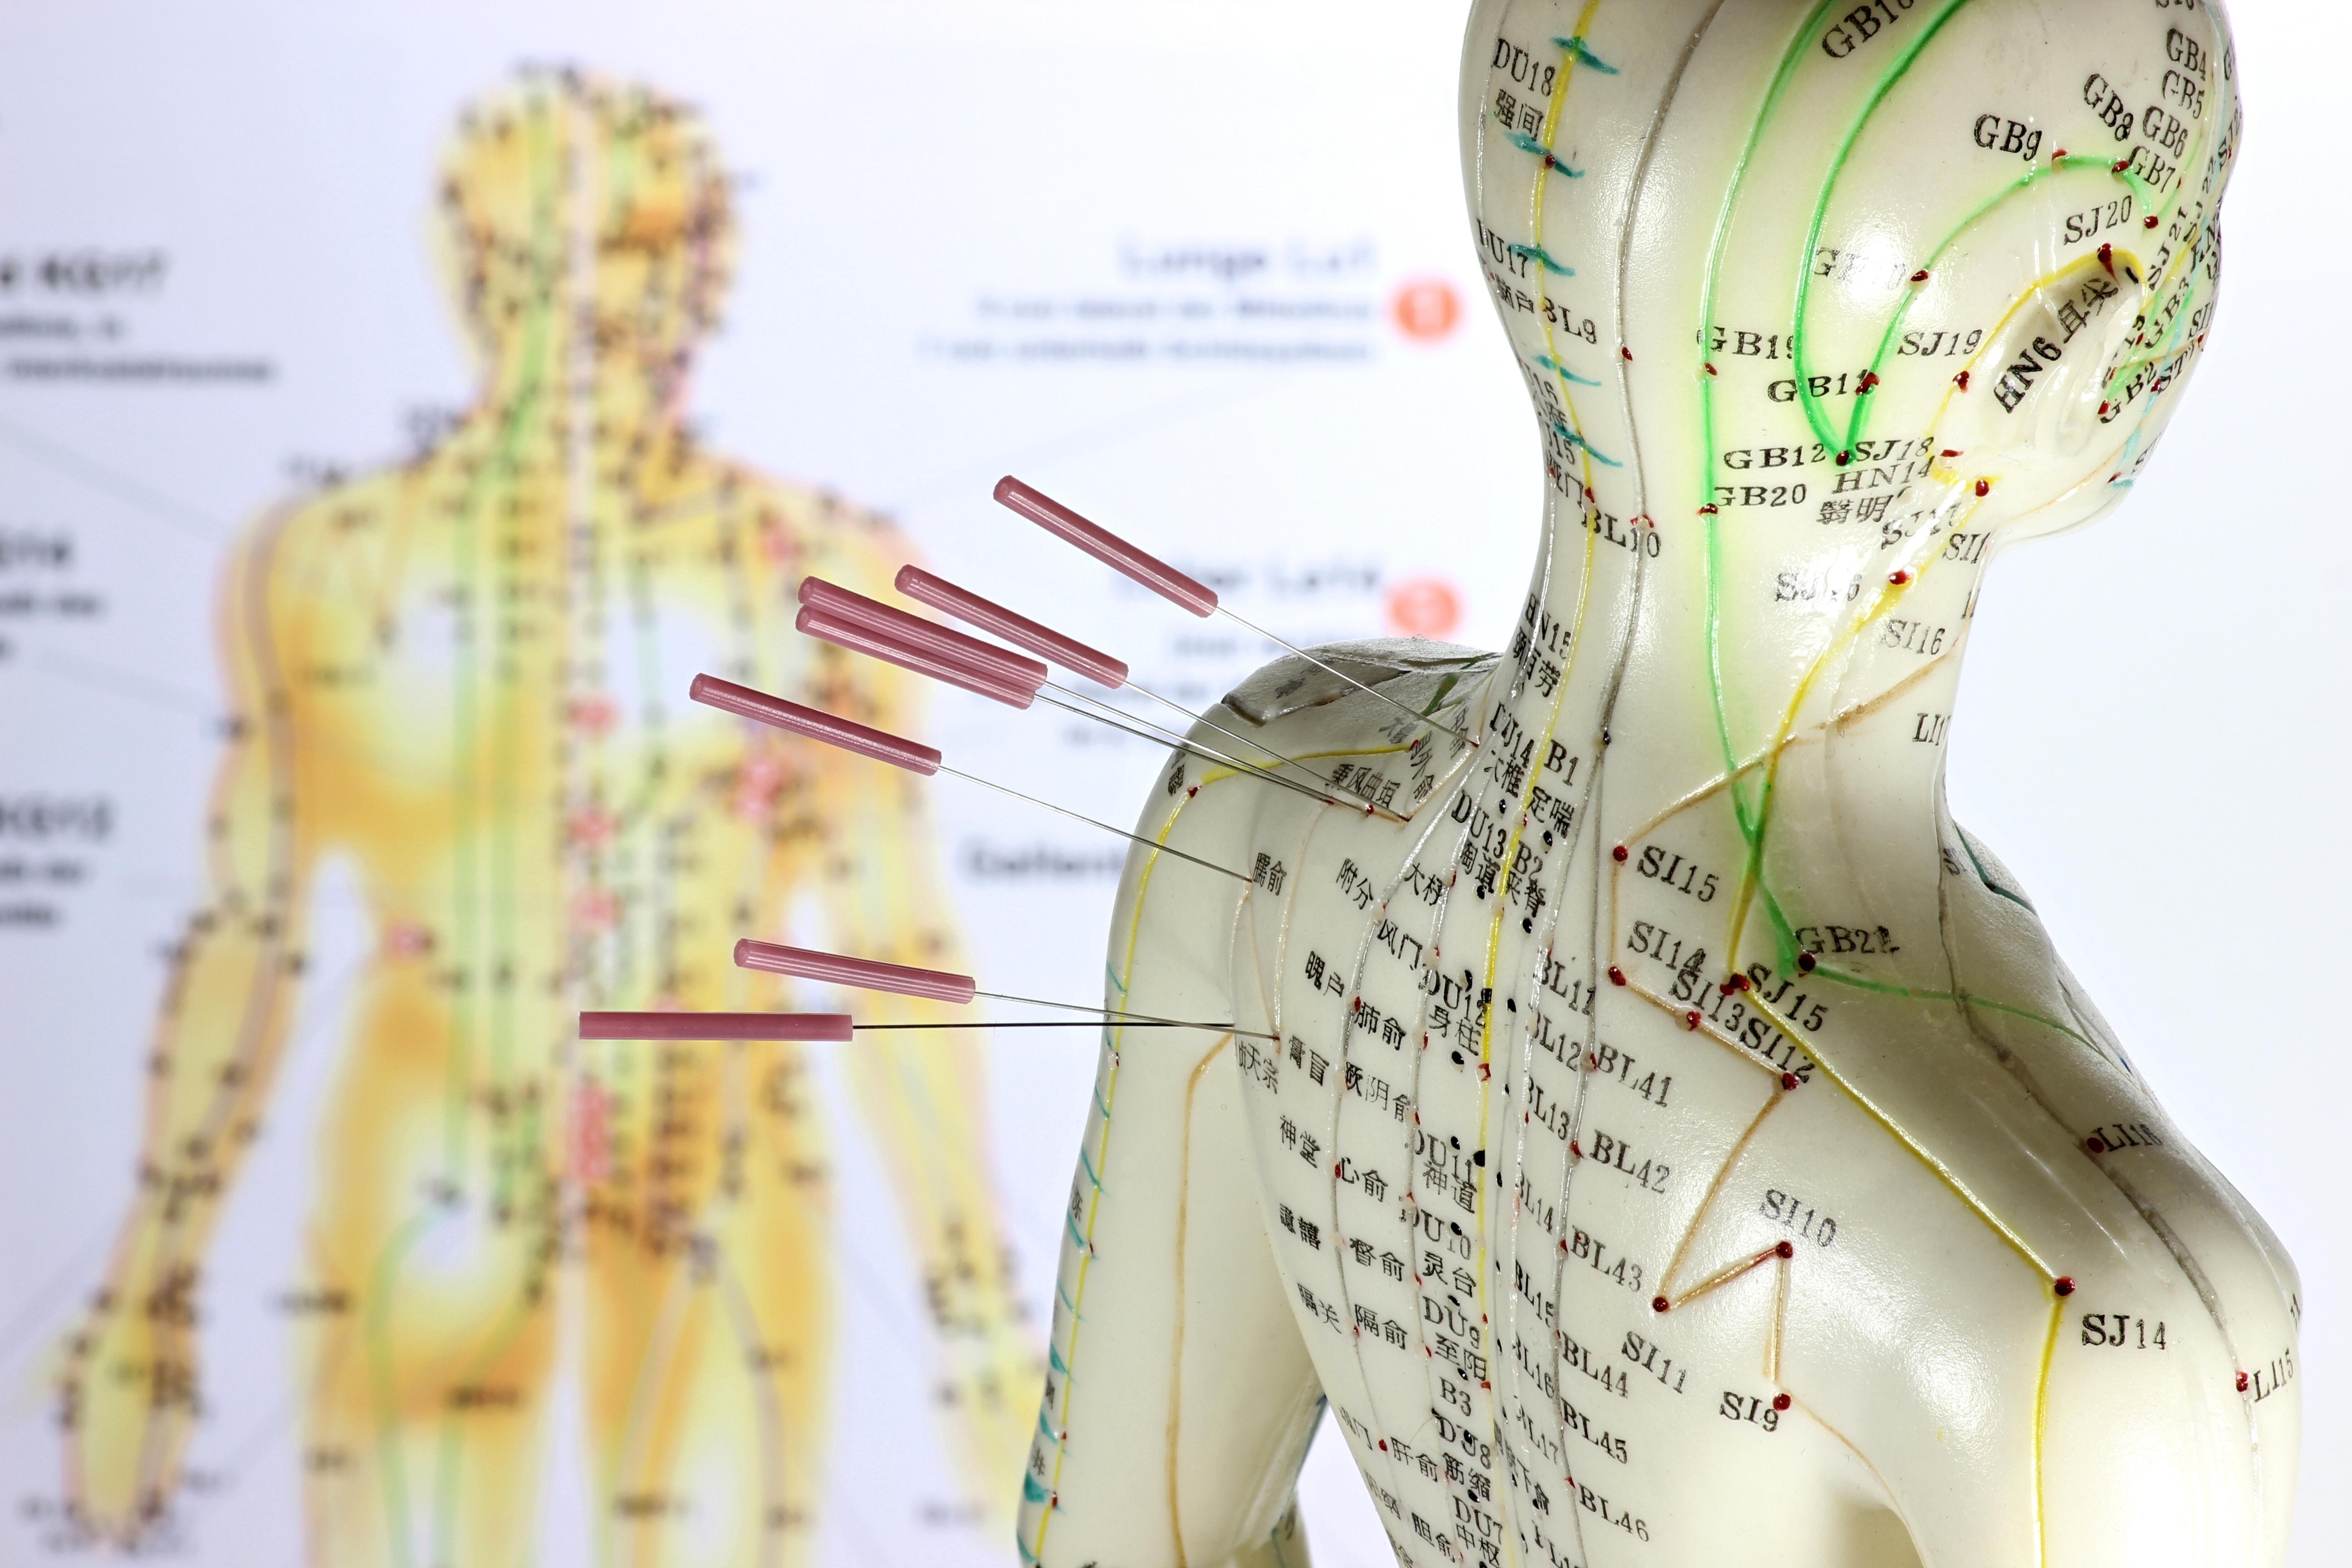 riveau osteopathe Arles Acupuncture